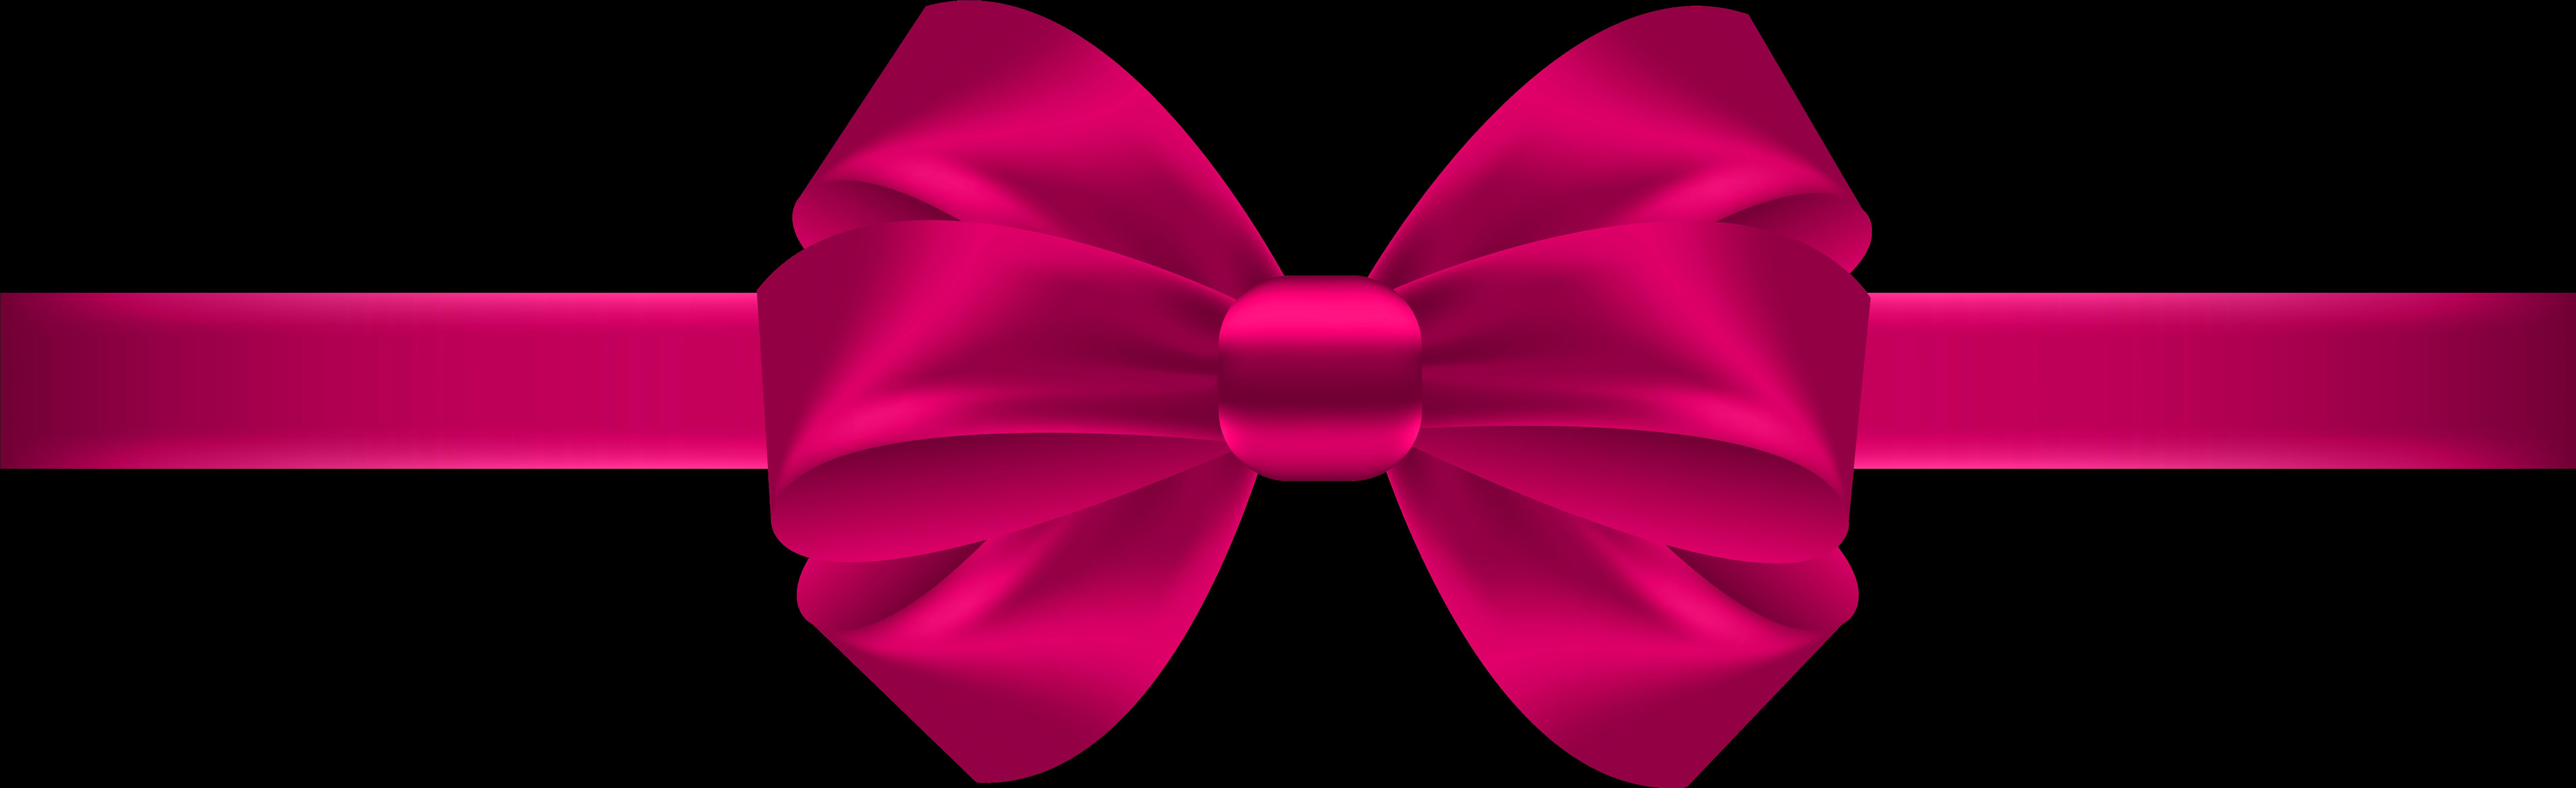 Clip Grip Lcr Ruger Hot Pink Ribbon Png Transparent Png Full